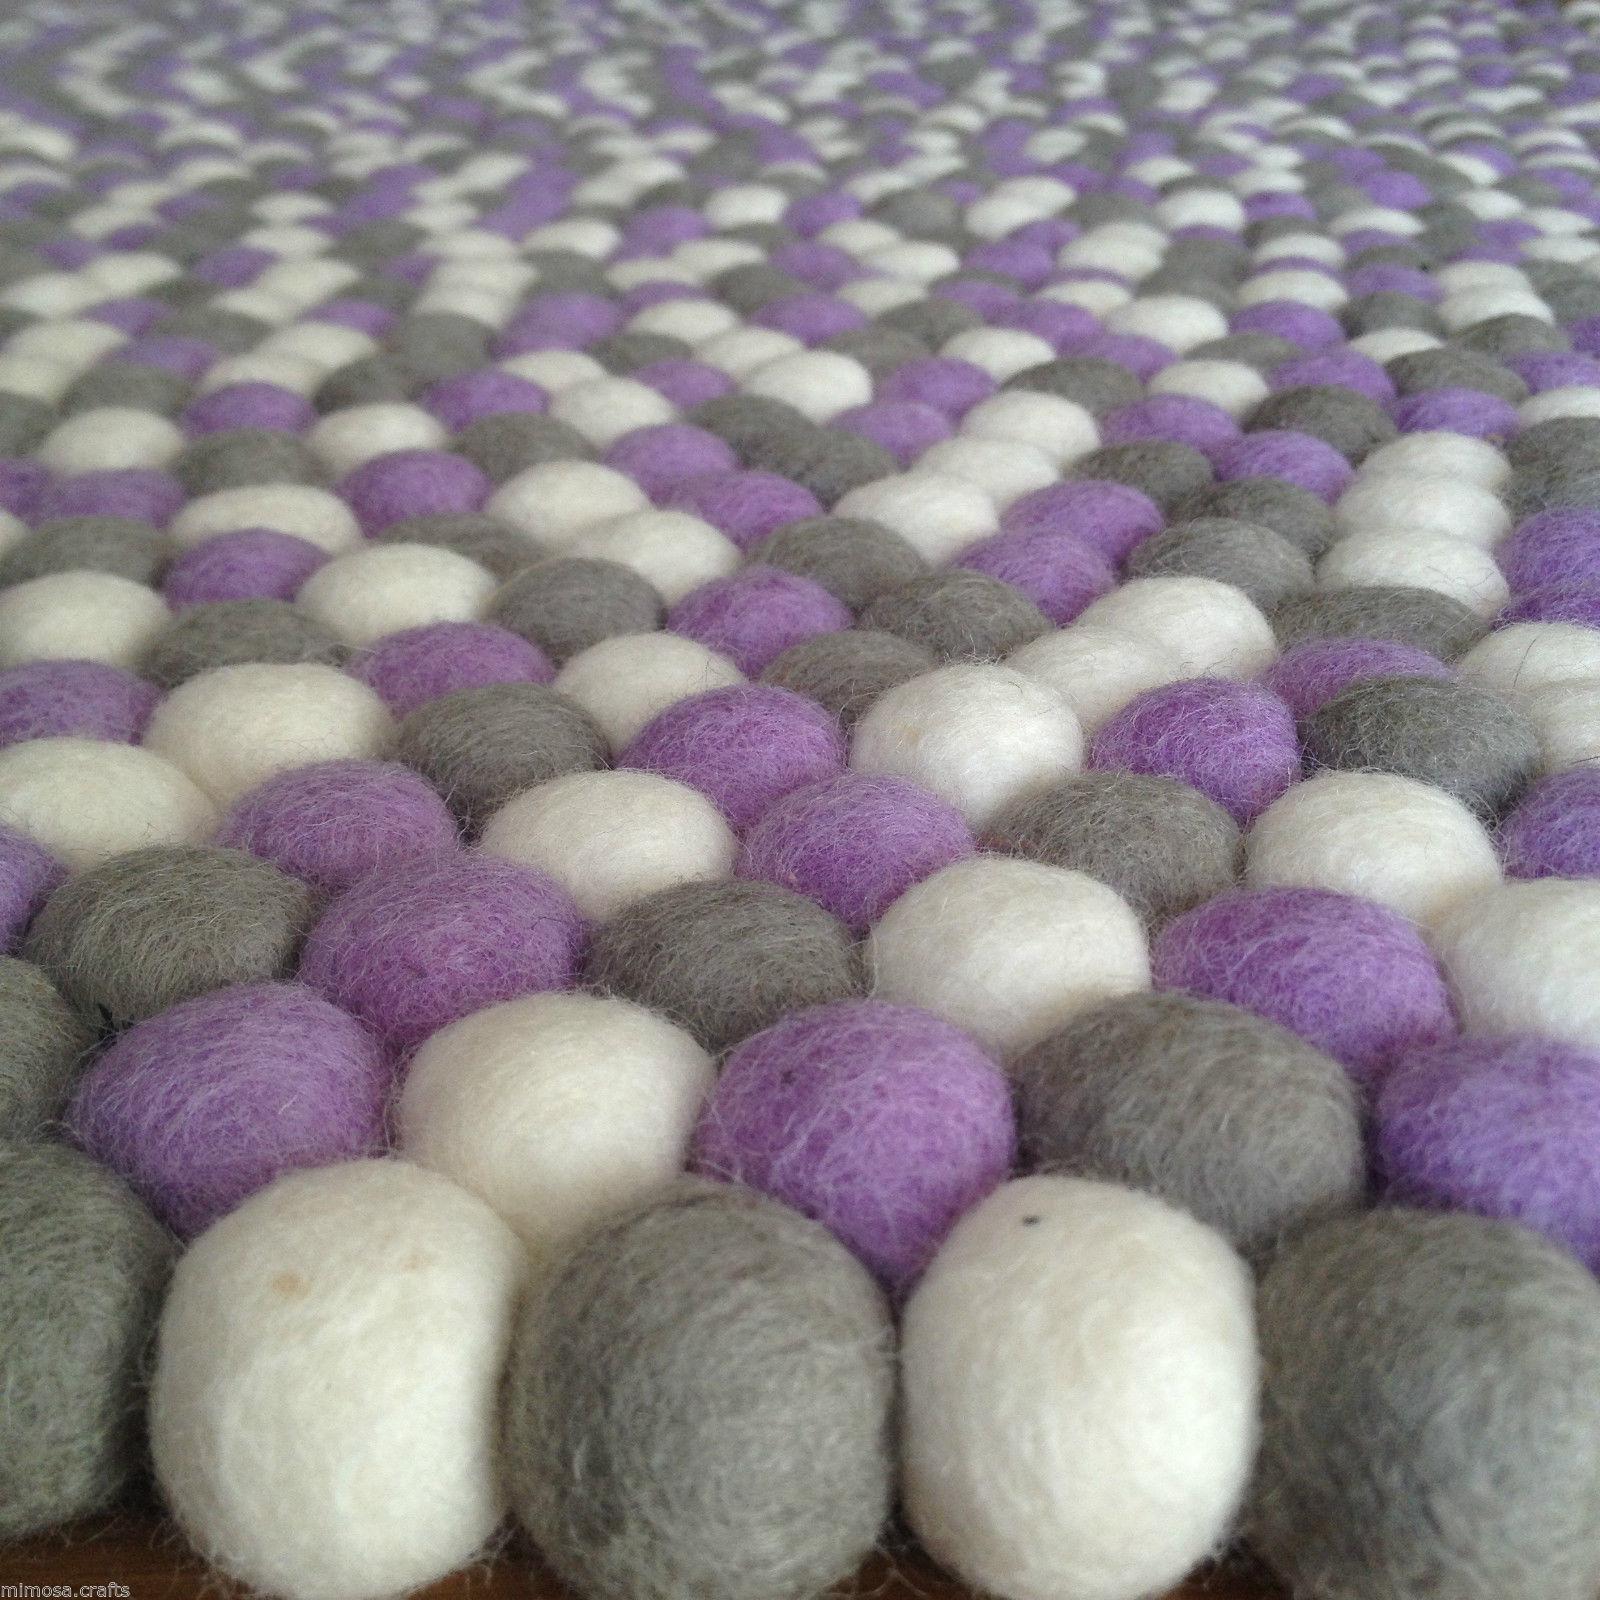 100% Woolen Nepalese Handmade viola Daisy Felt Ball Rug Kids Room Nursery Mat